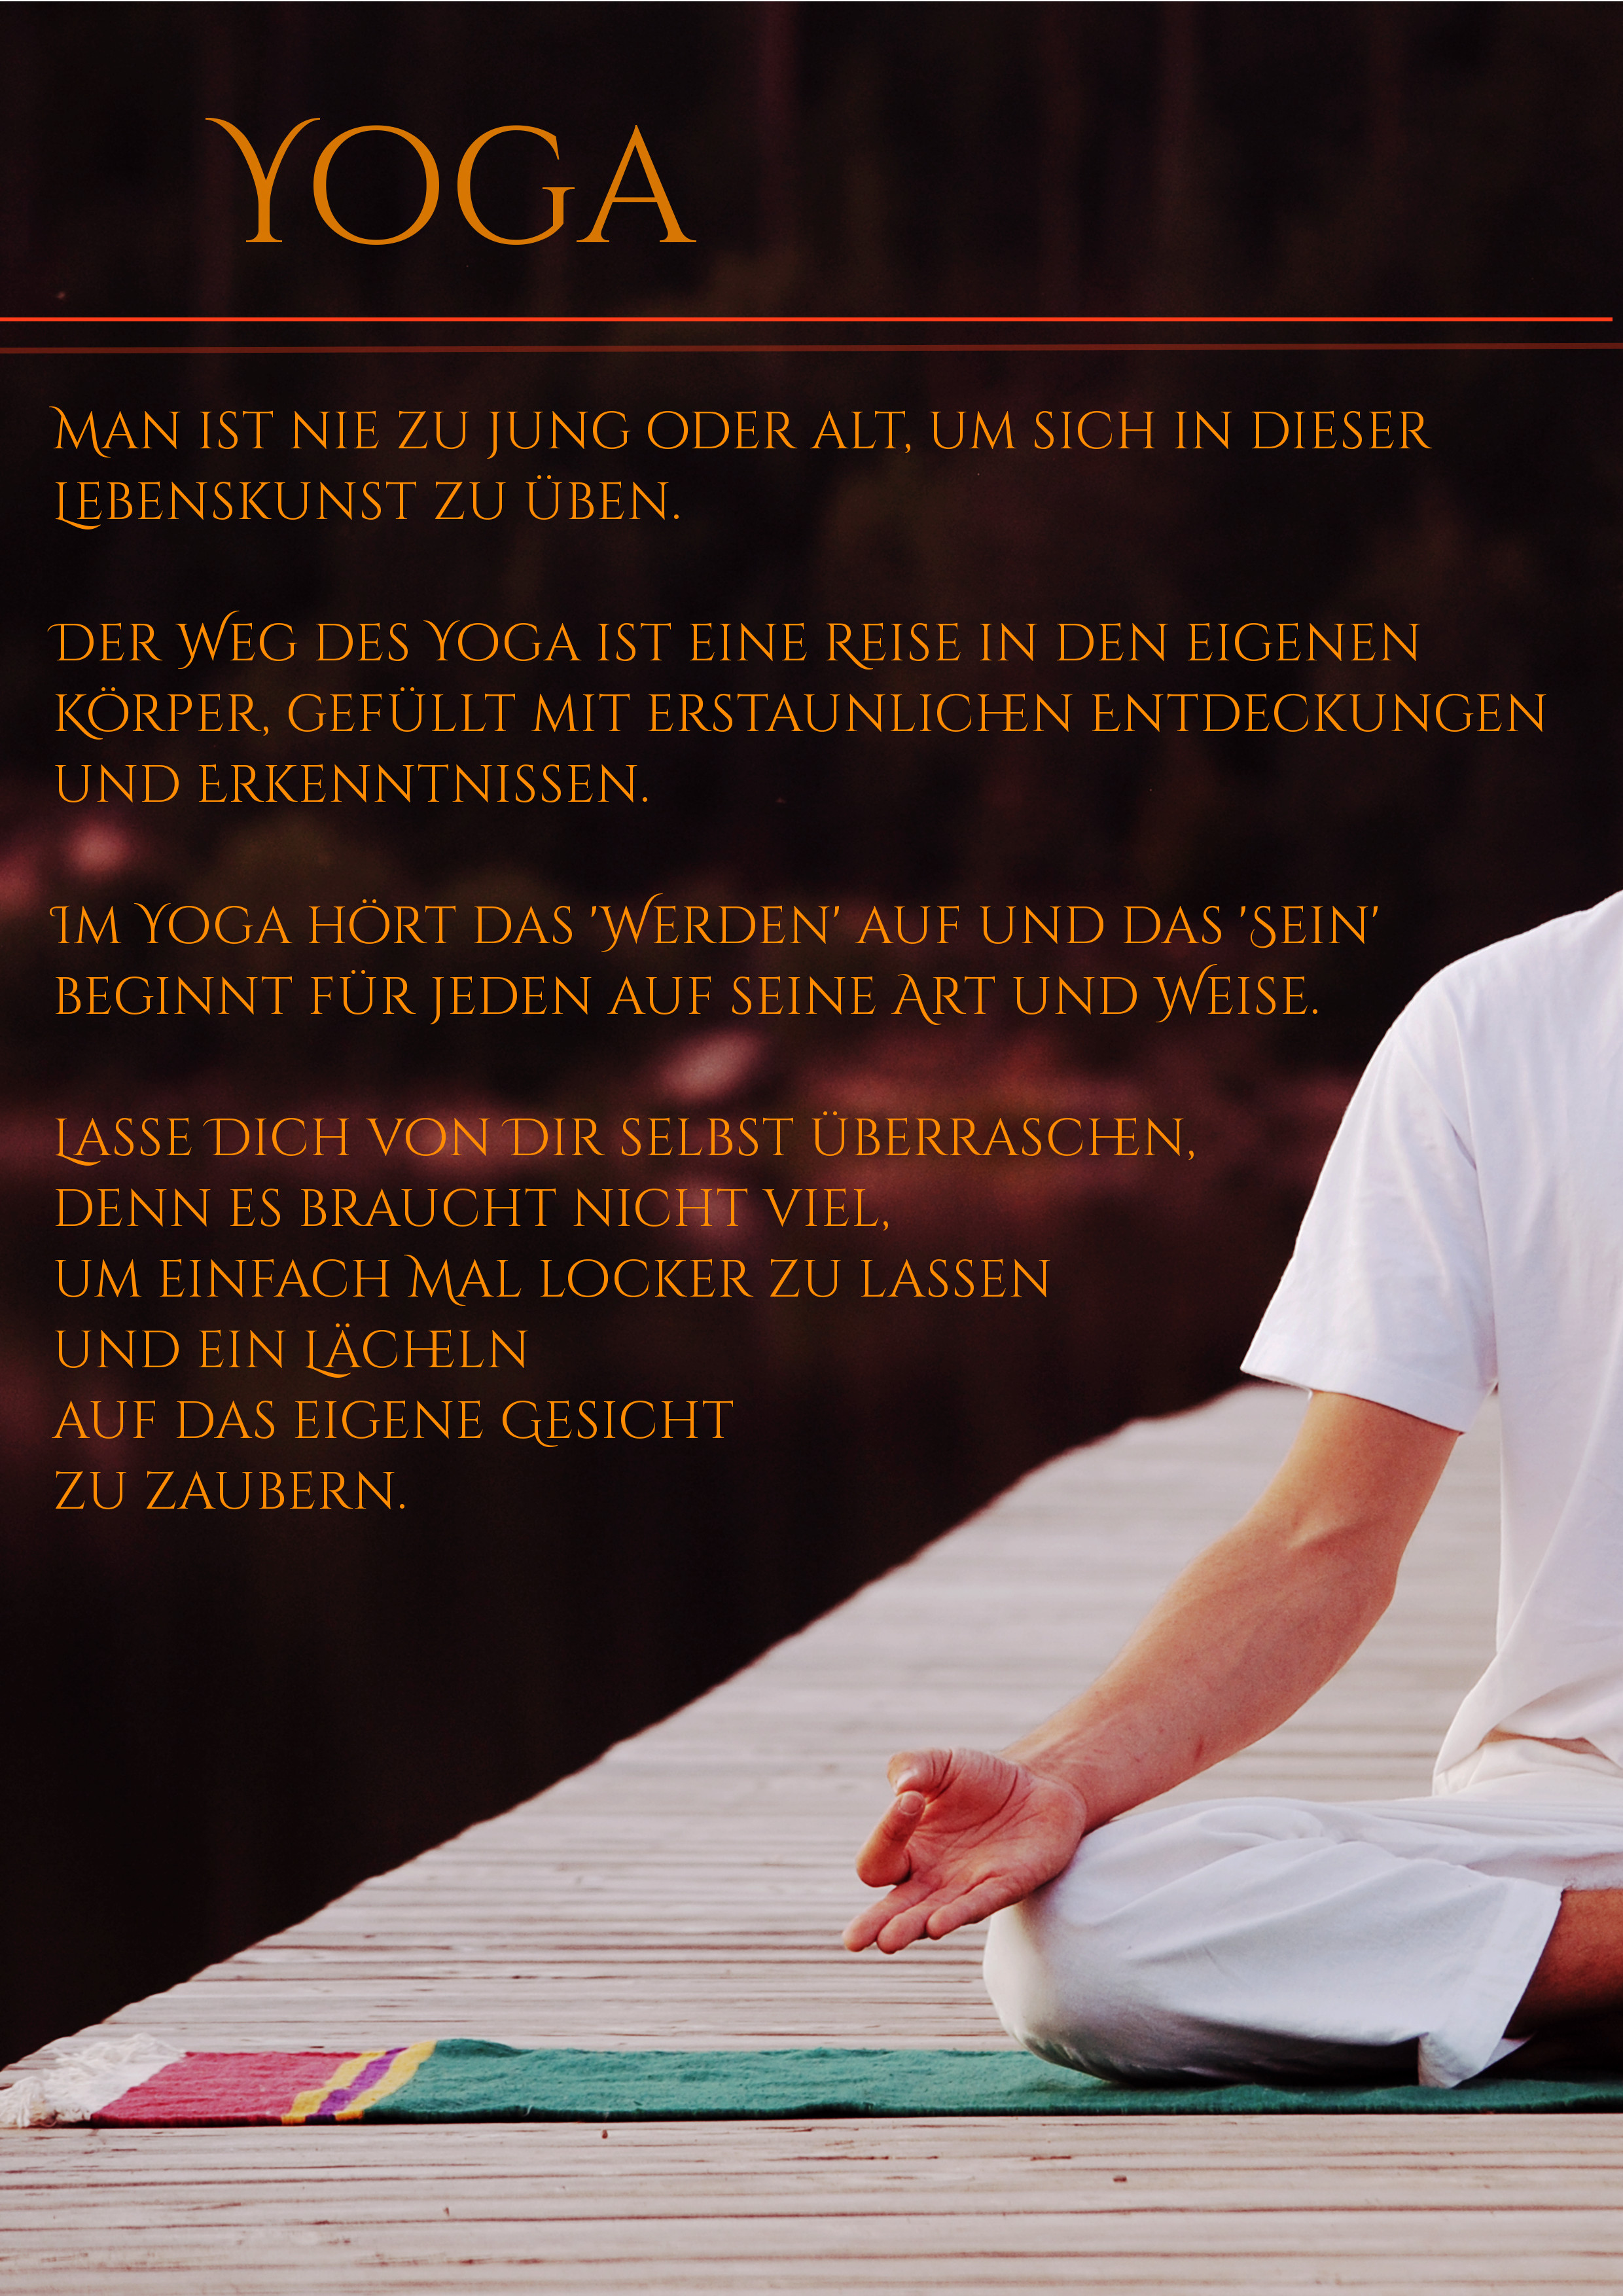 YogaPhilosophie, Lebenskunst & Gedanken -